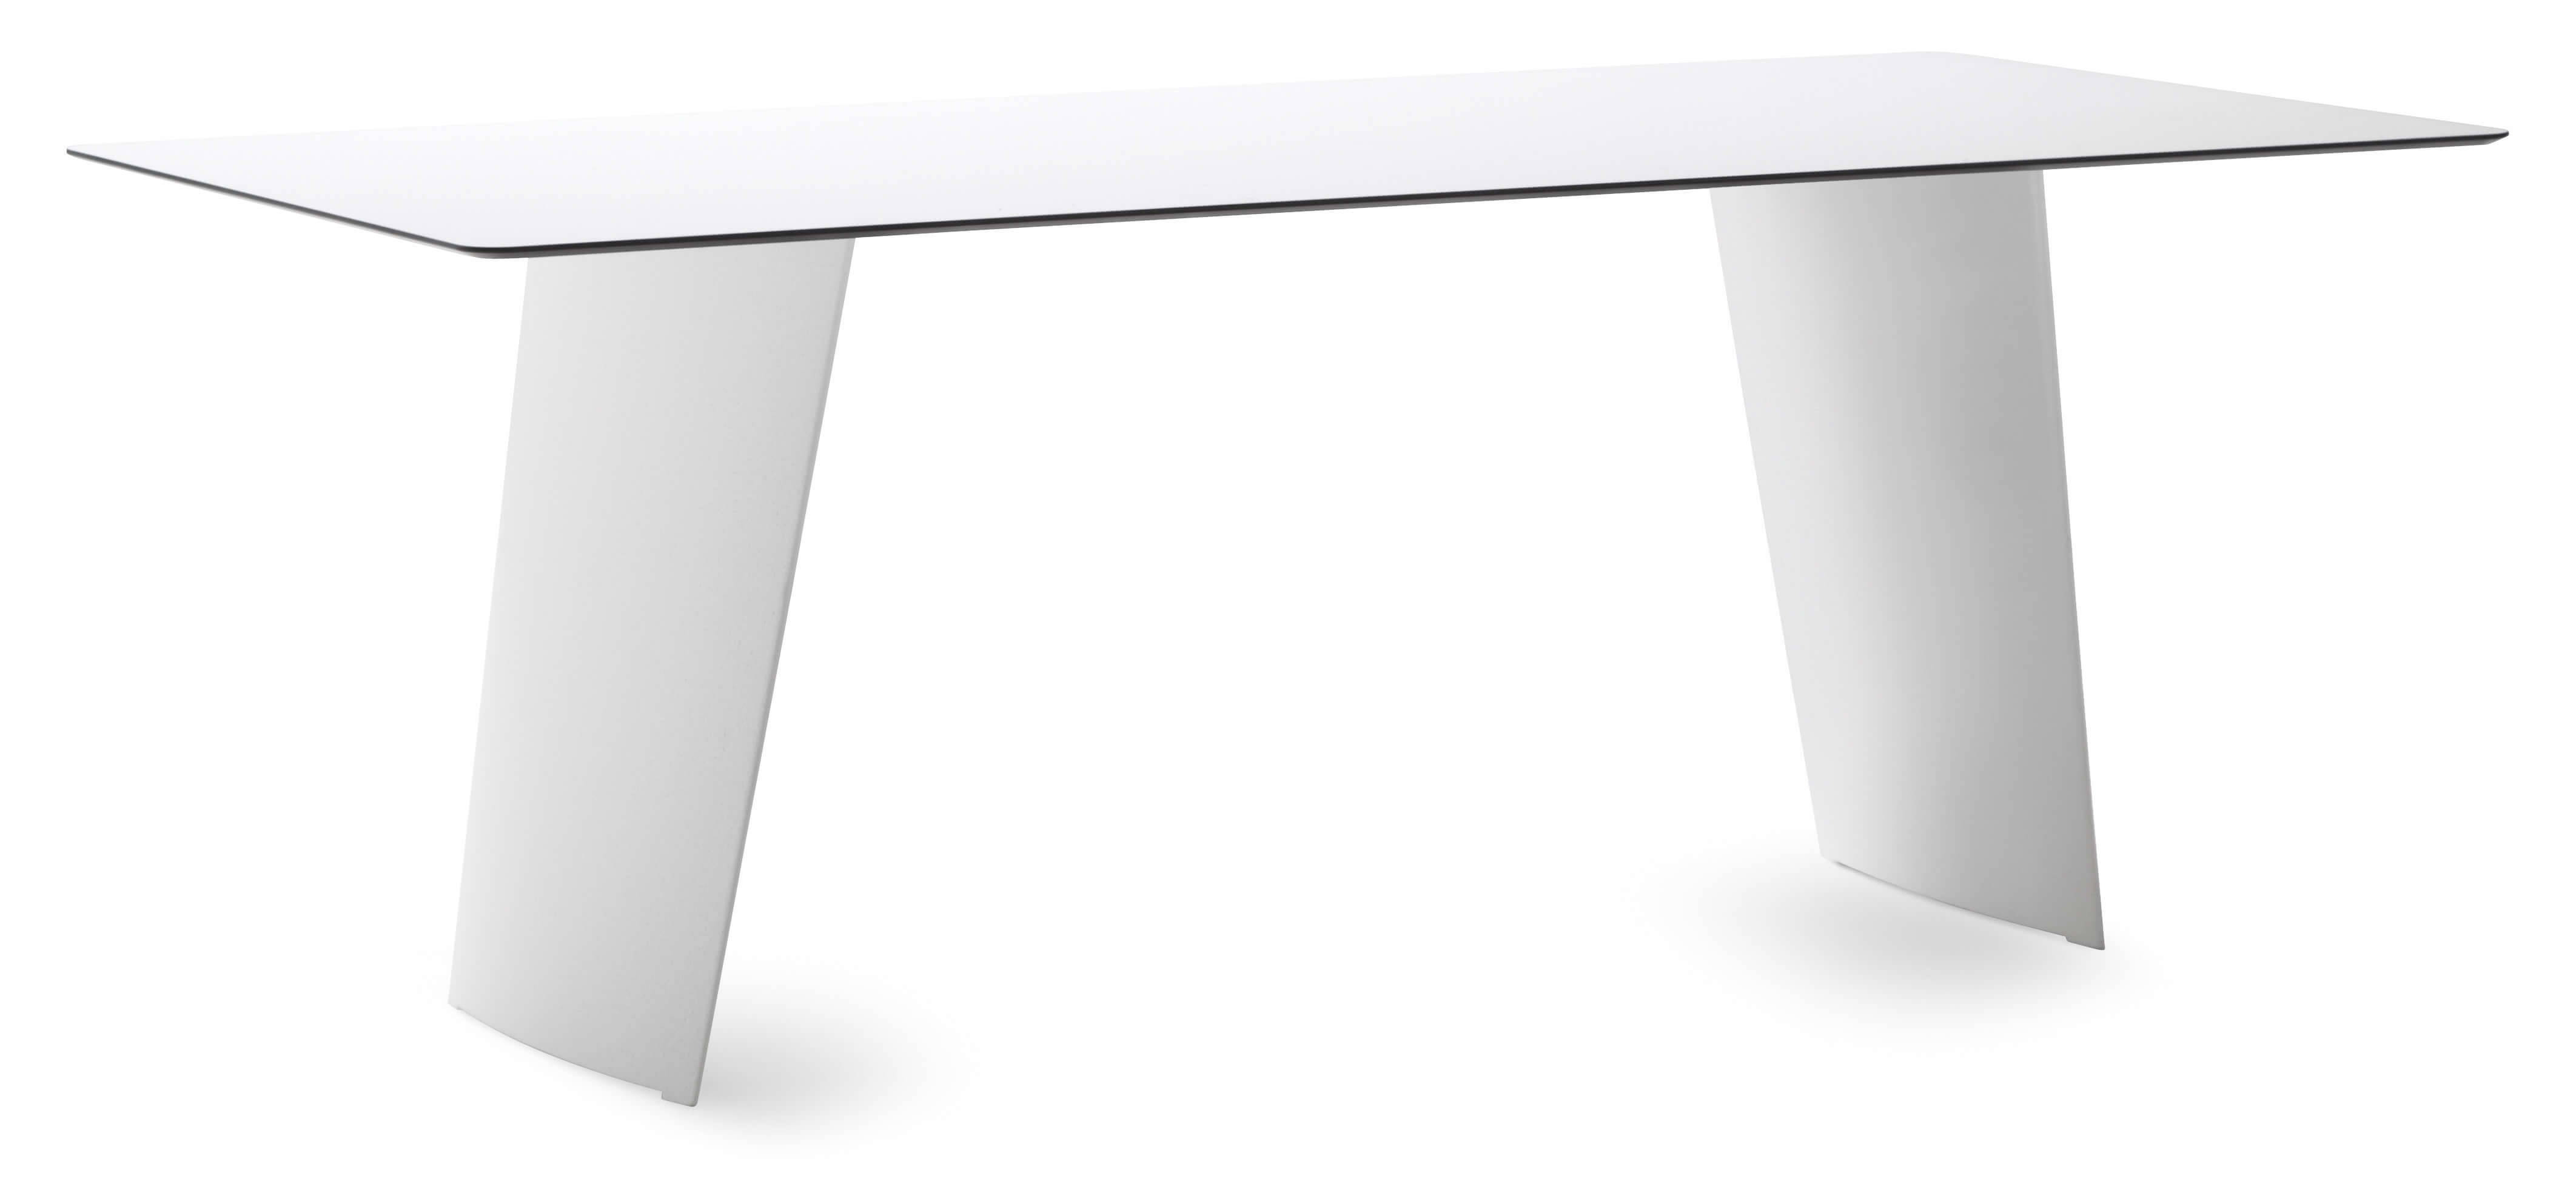 Stone-t 200 Rectangular Table by DomItalia, Italy